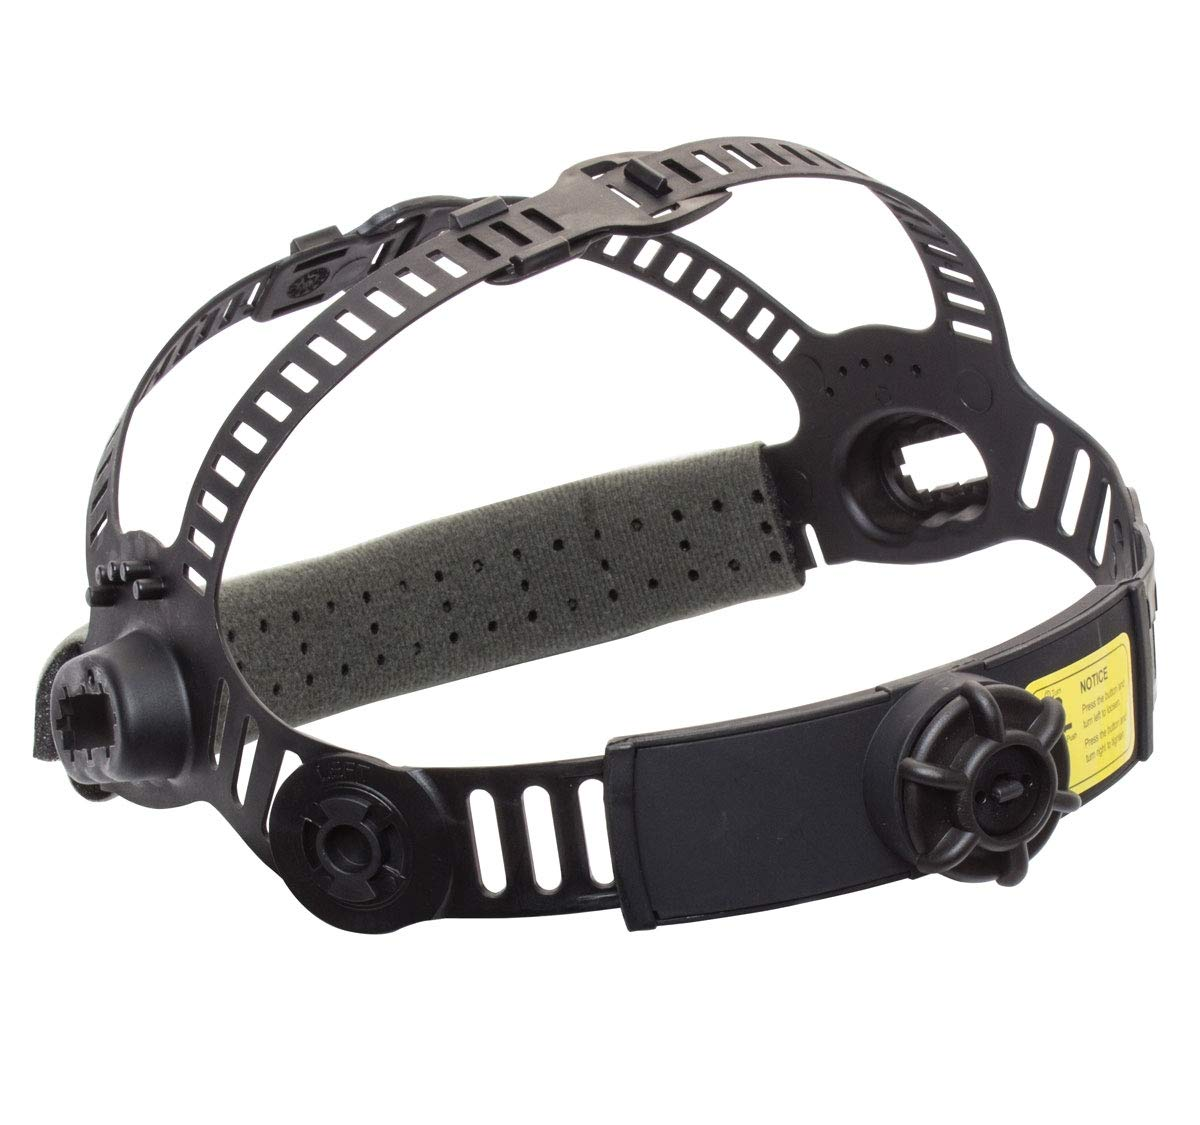 Eastwood Xl View Auto Darkening Welding Helmet Mask Kit Adjustable Headband Comfortable - Xl9300 by Eastwood (Image #8)